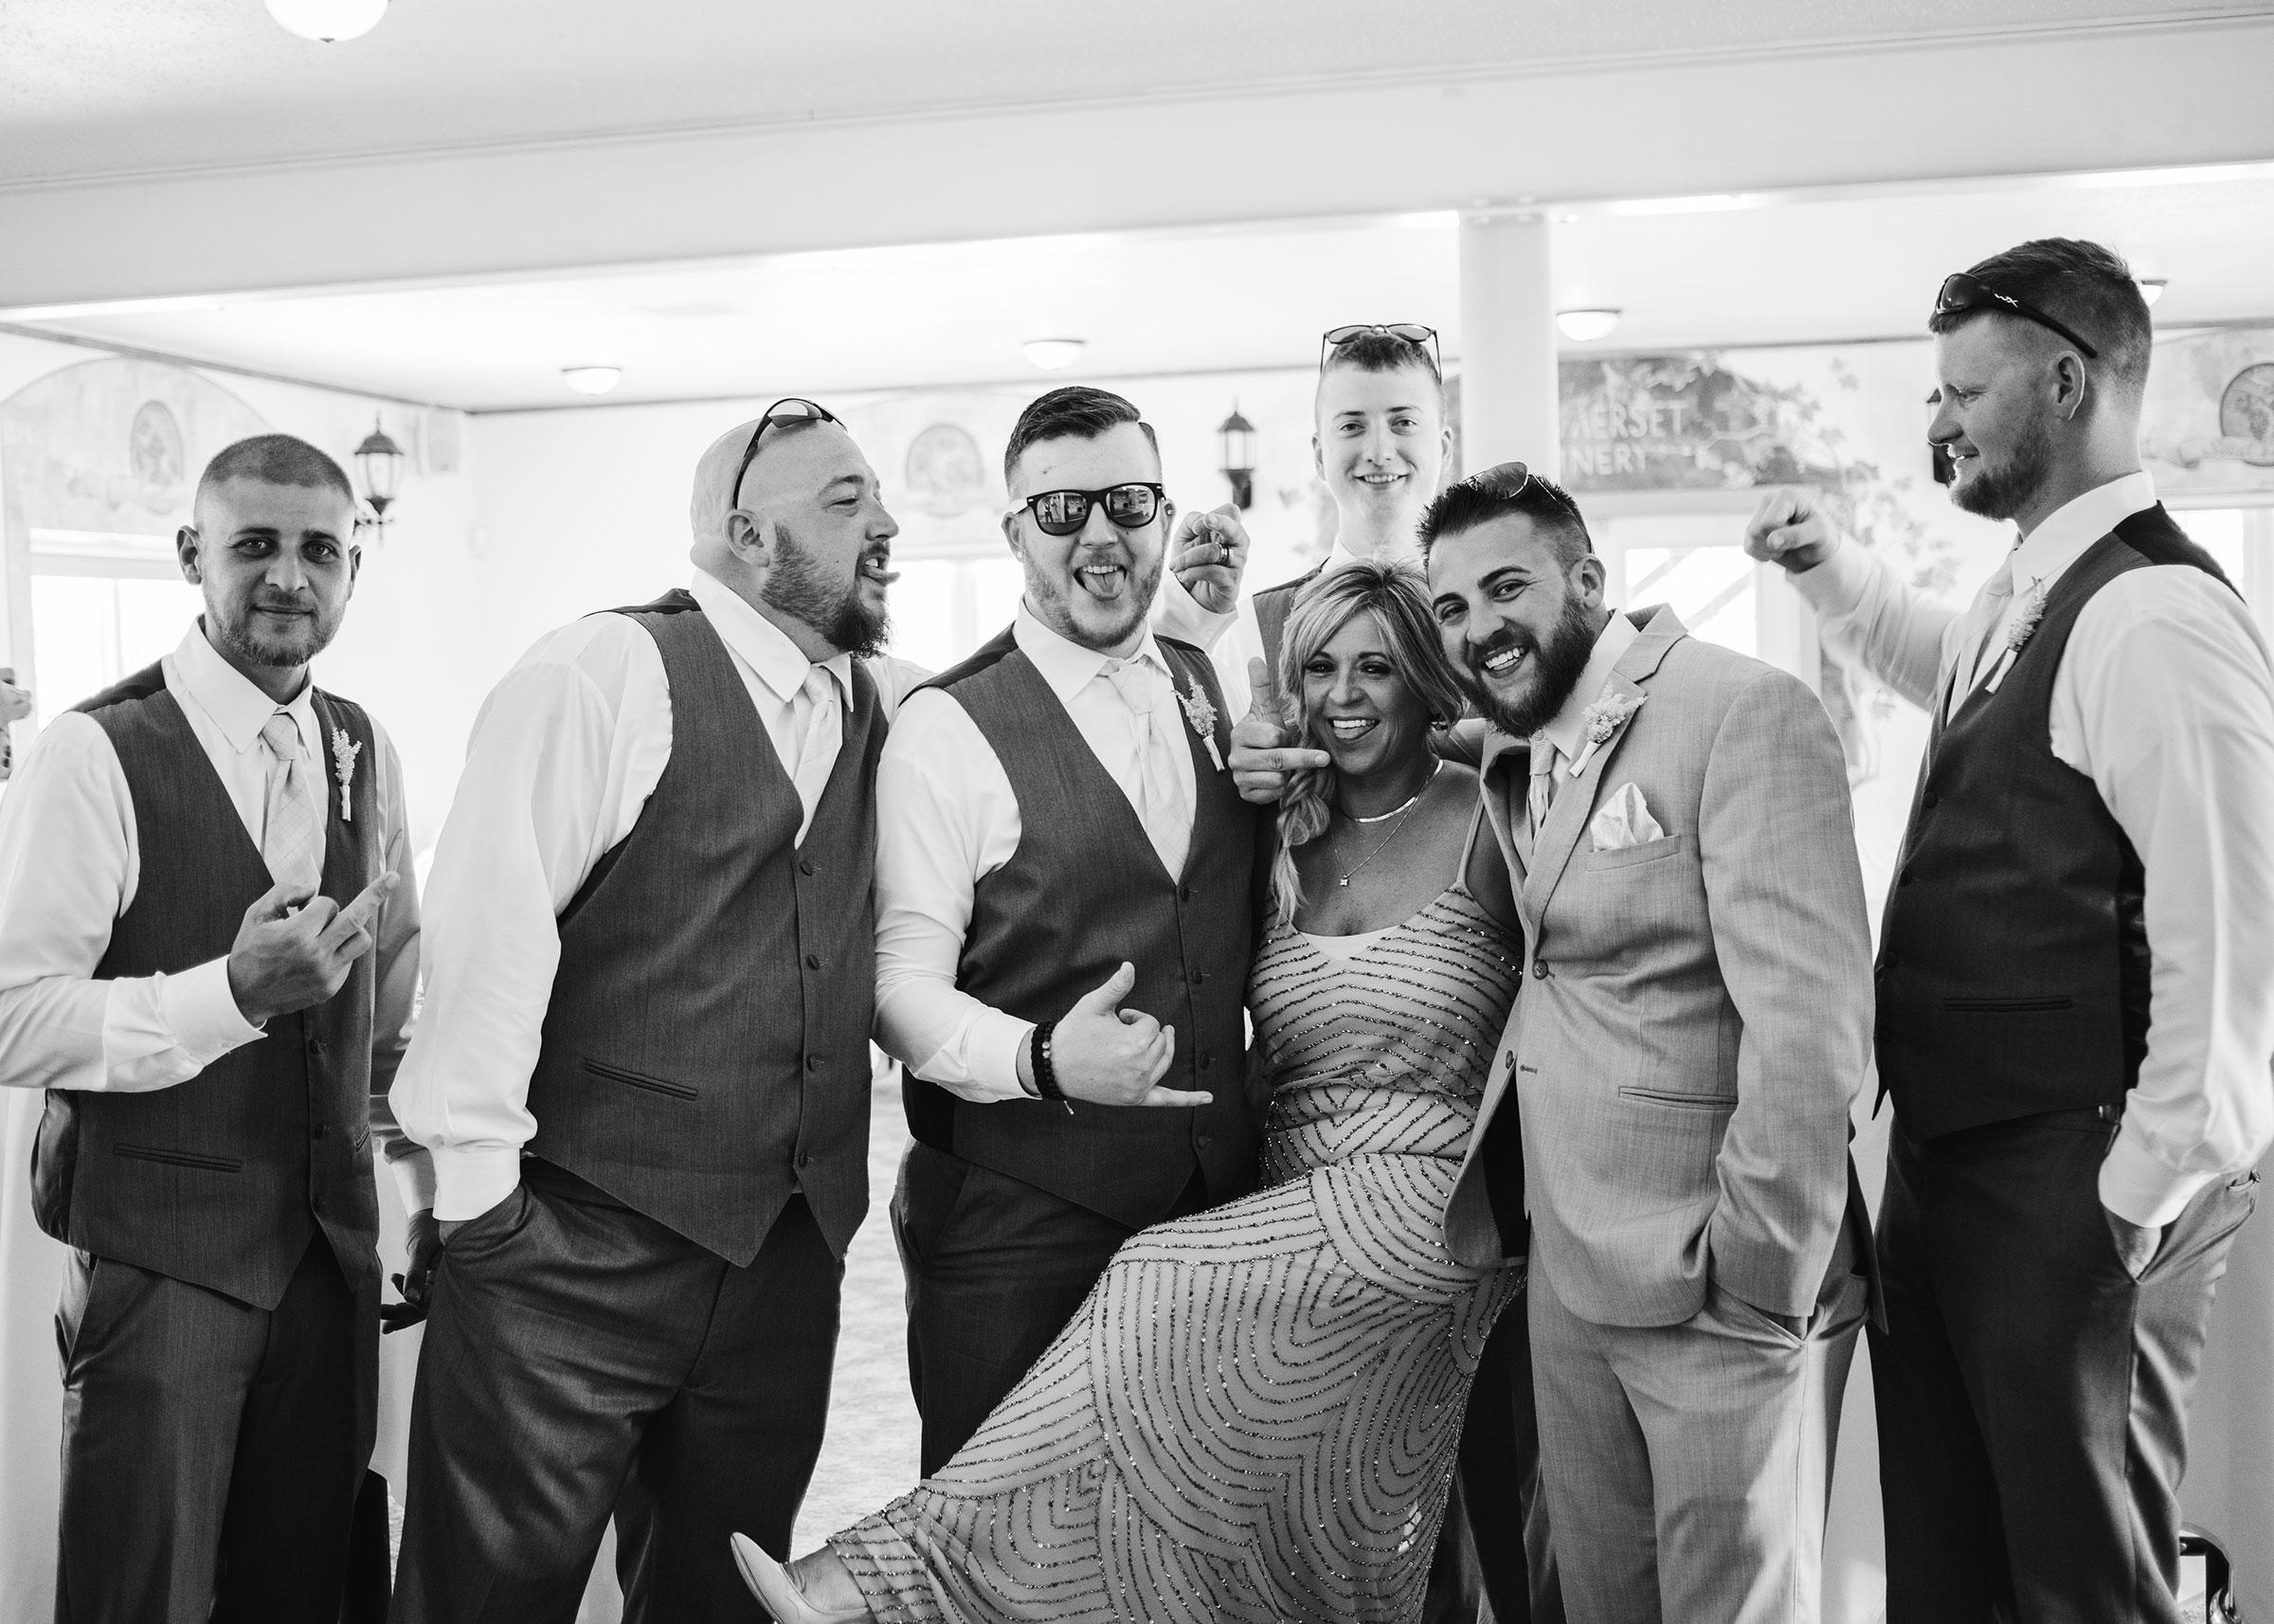 groomsmen-posing-with-mother-of-groom-wedding-summerset-winery-indianola-iowa-raelyn-ramey-photography.jpg